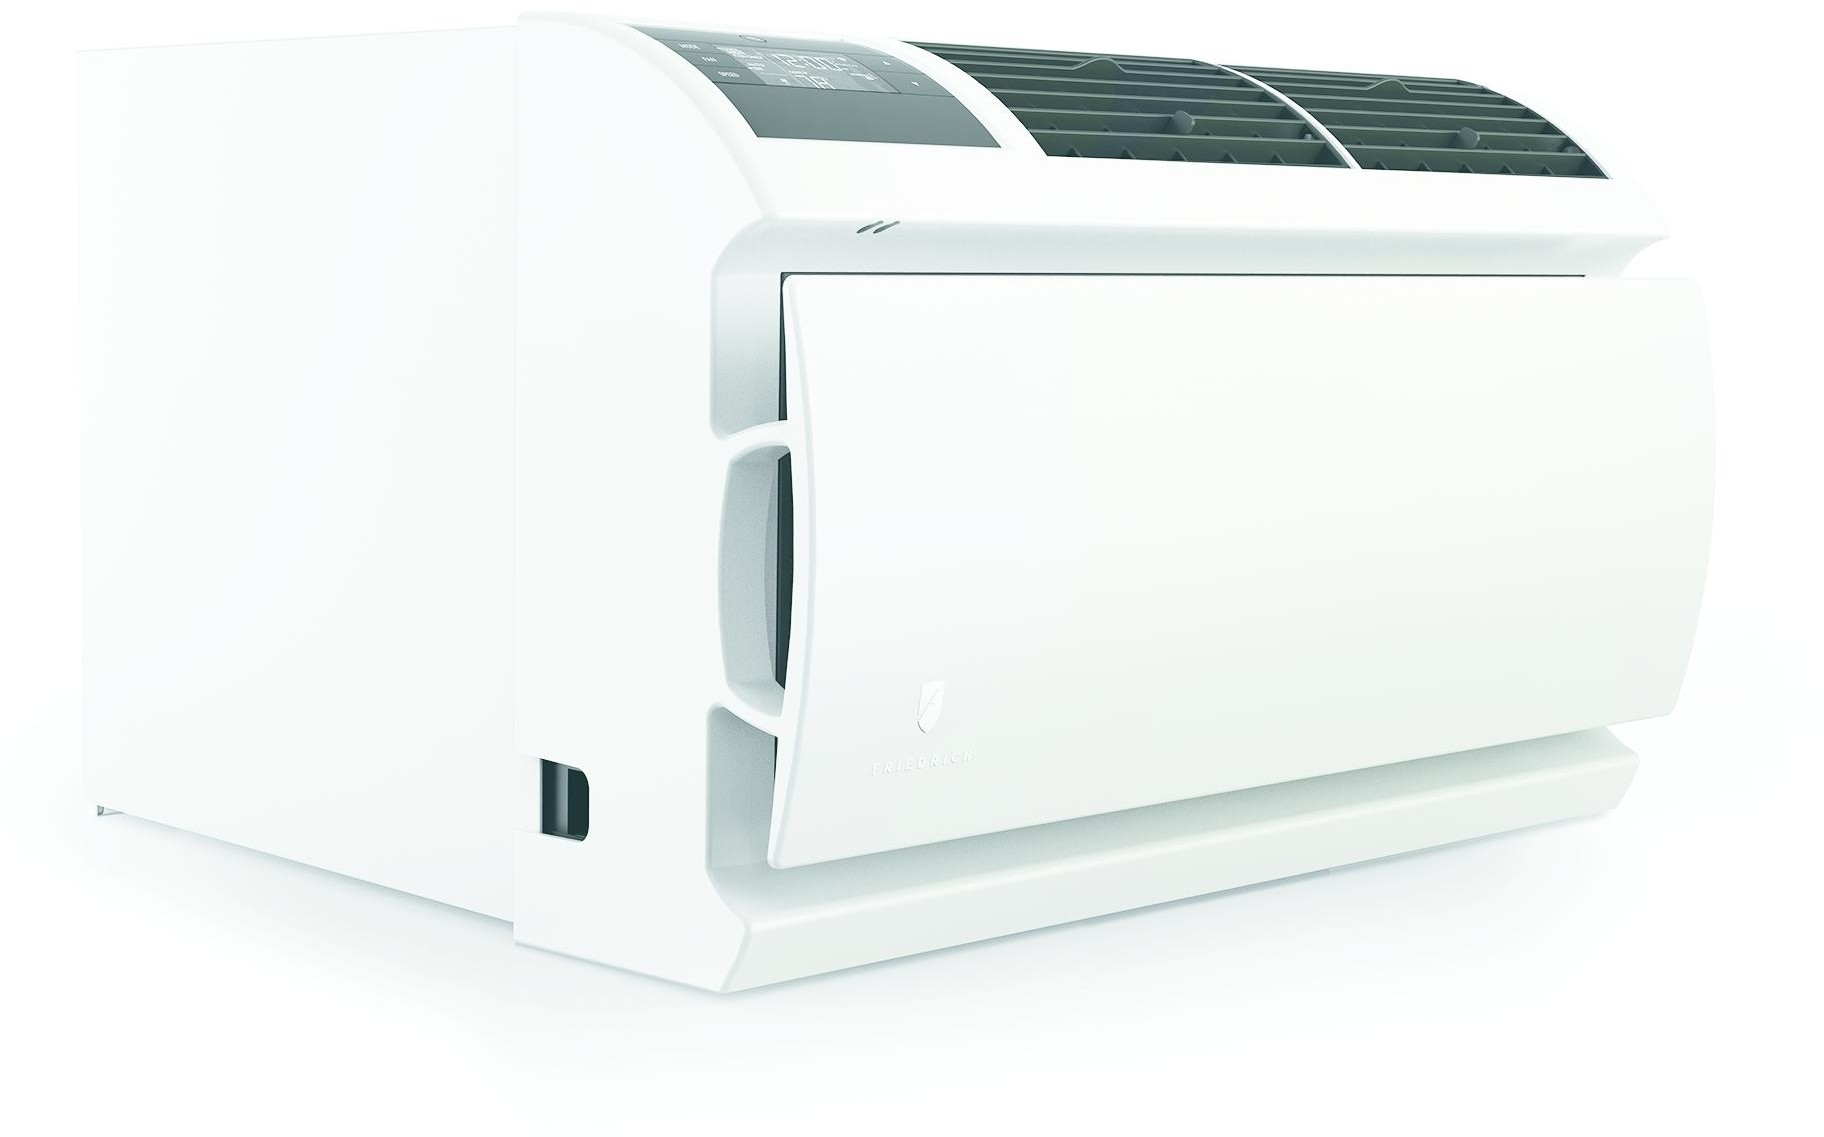 Friedrich WallMaster 8,000 BTU Wall Air Conditioner WCT08A10A